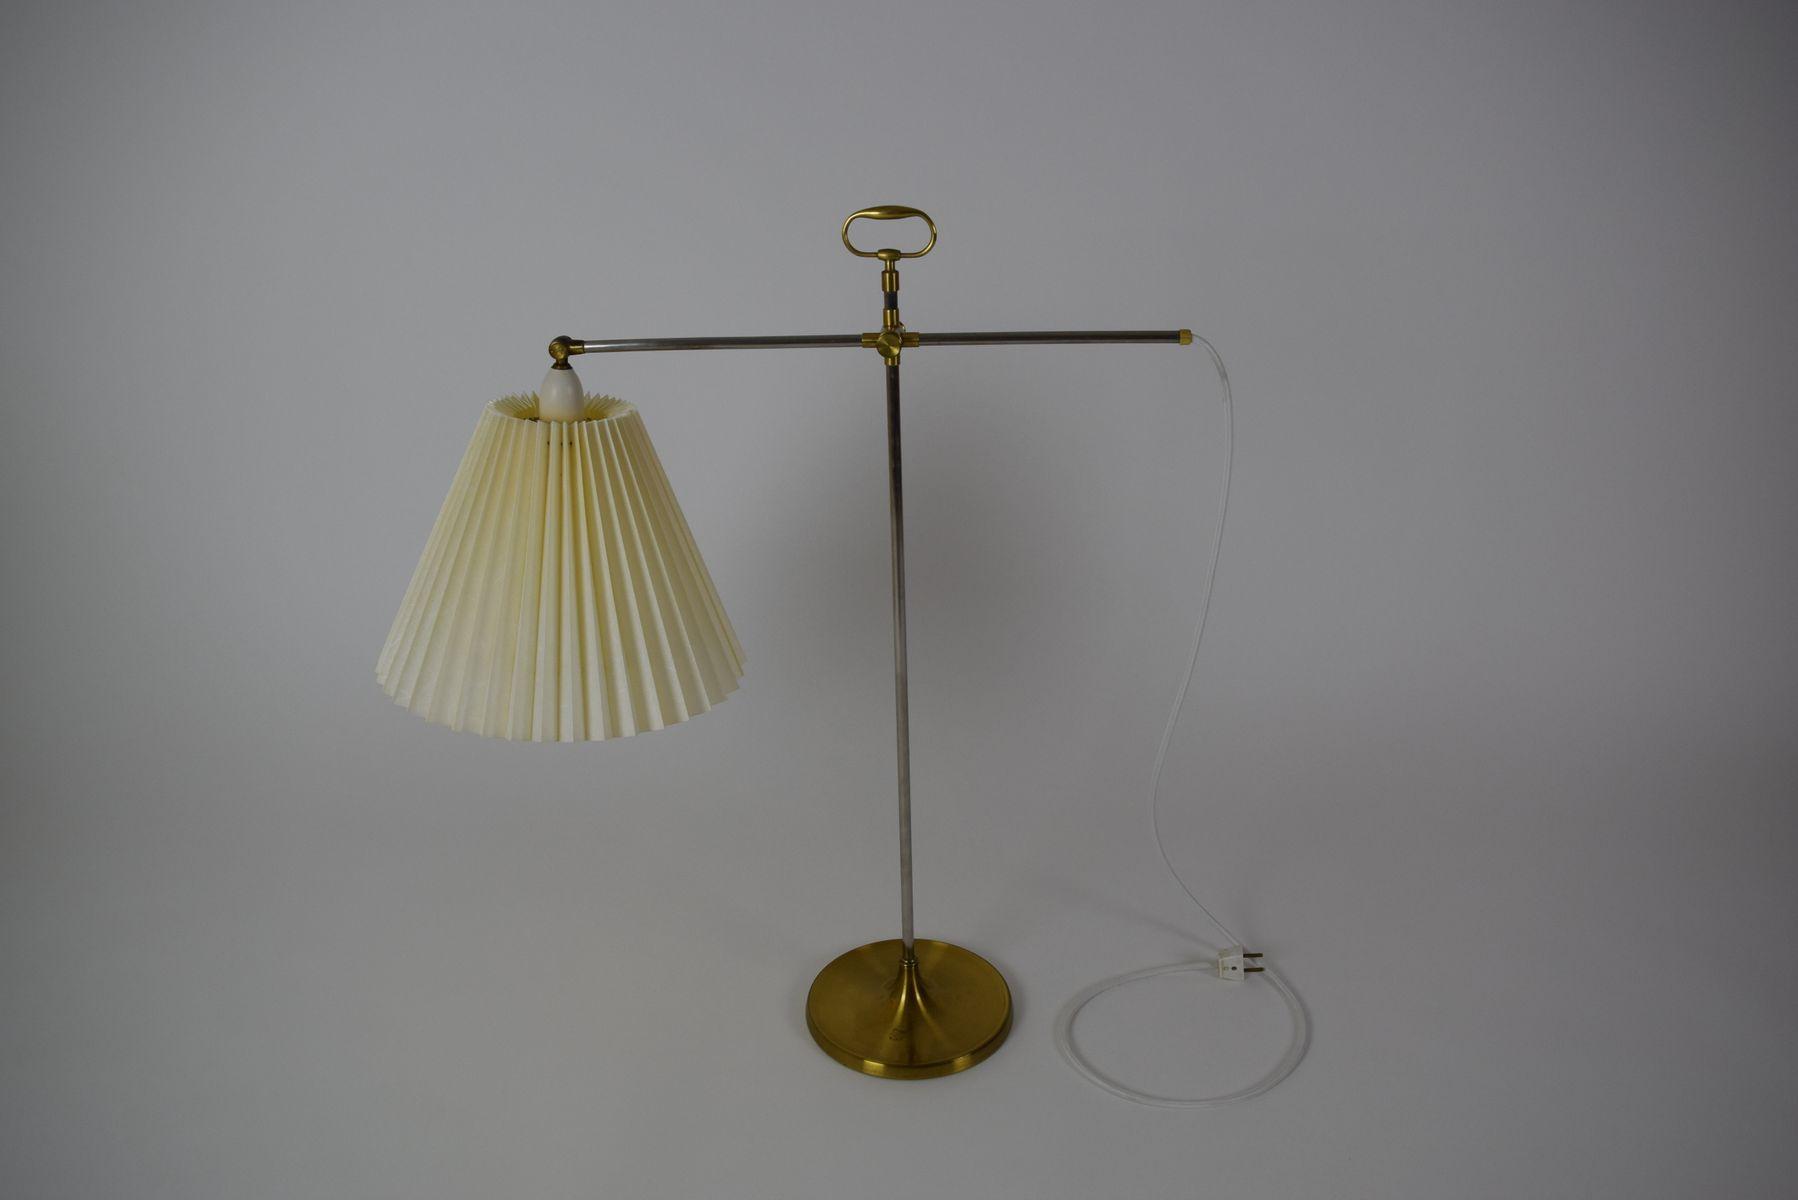 Vintage Model 319 Table Lamp by Kaare Esben Klint for Le Klint